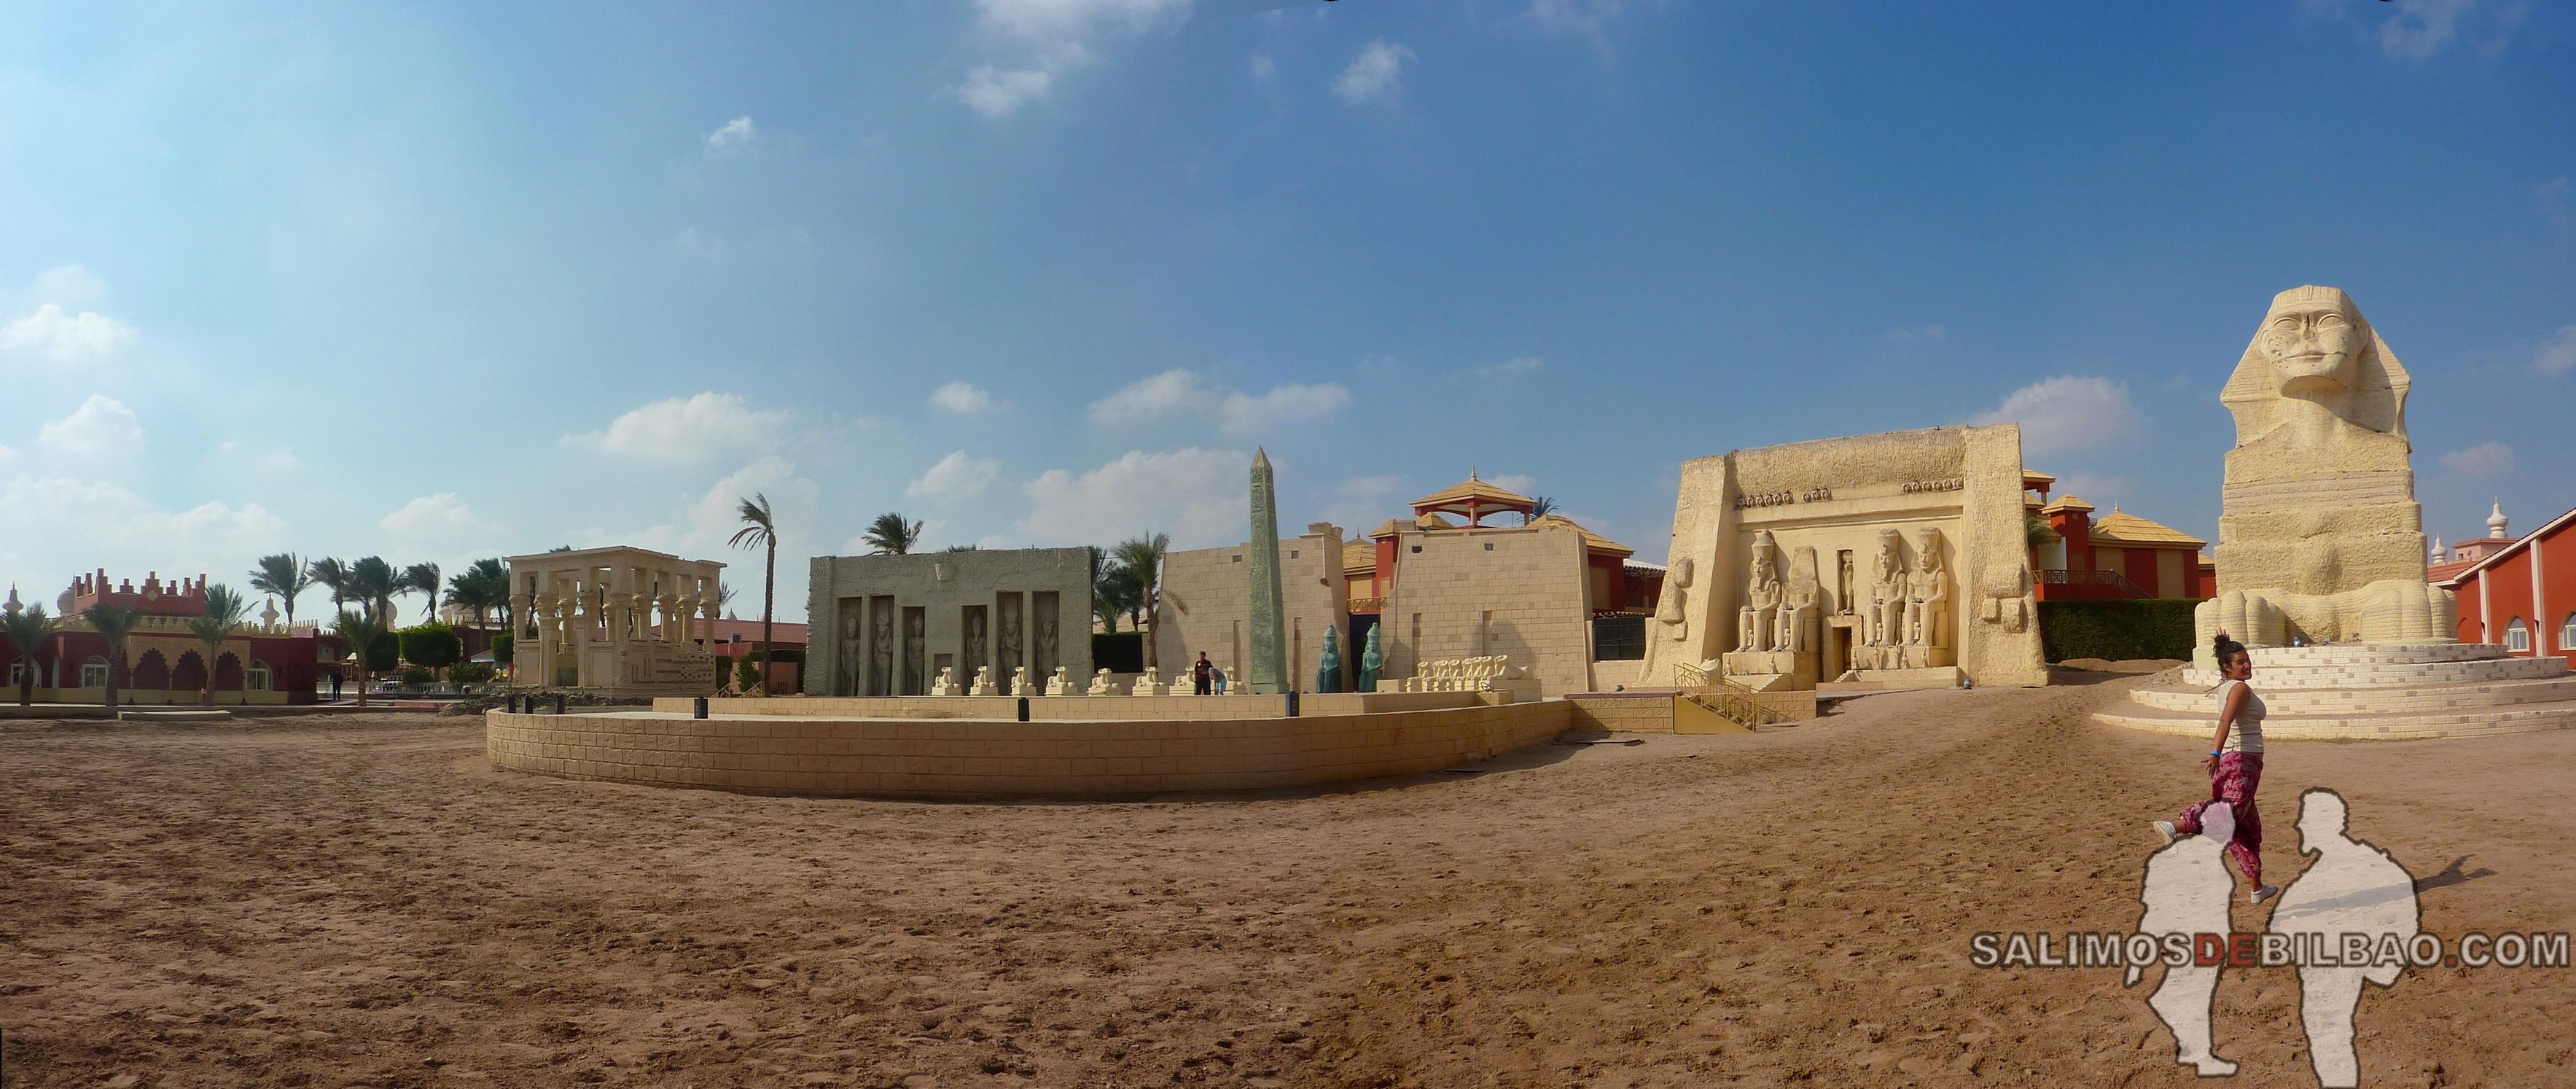 1190. Saioa, Pano, Htl Alf Leila Wa Leila, Hurghada